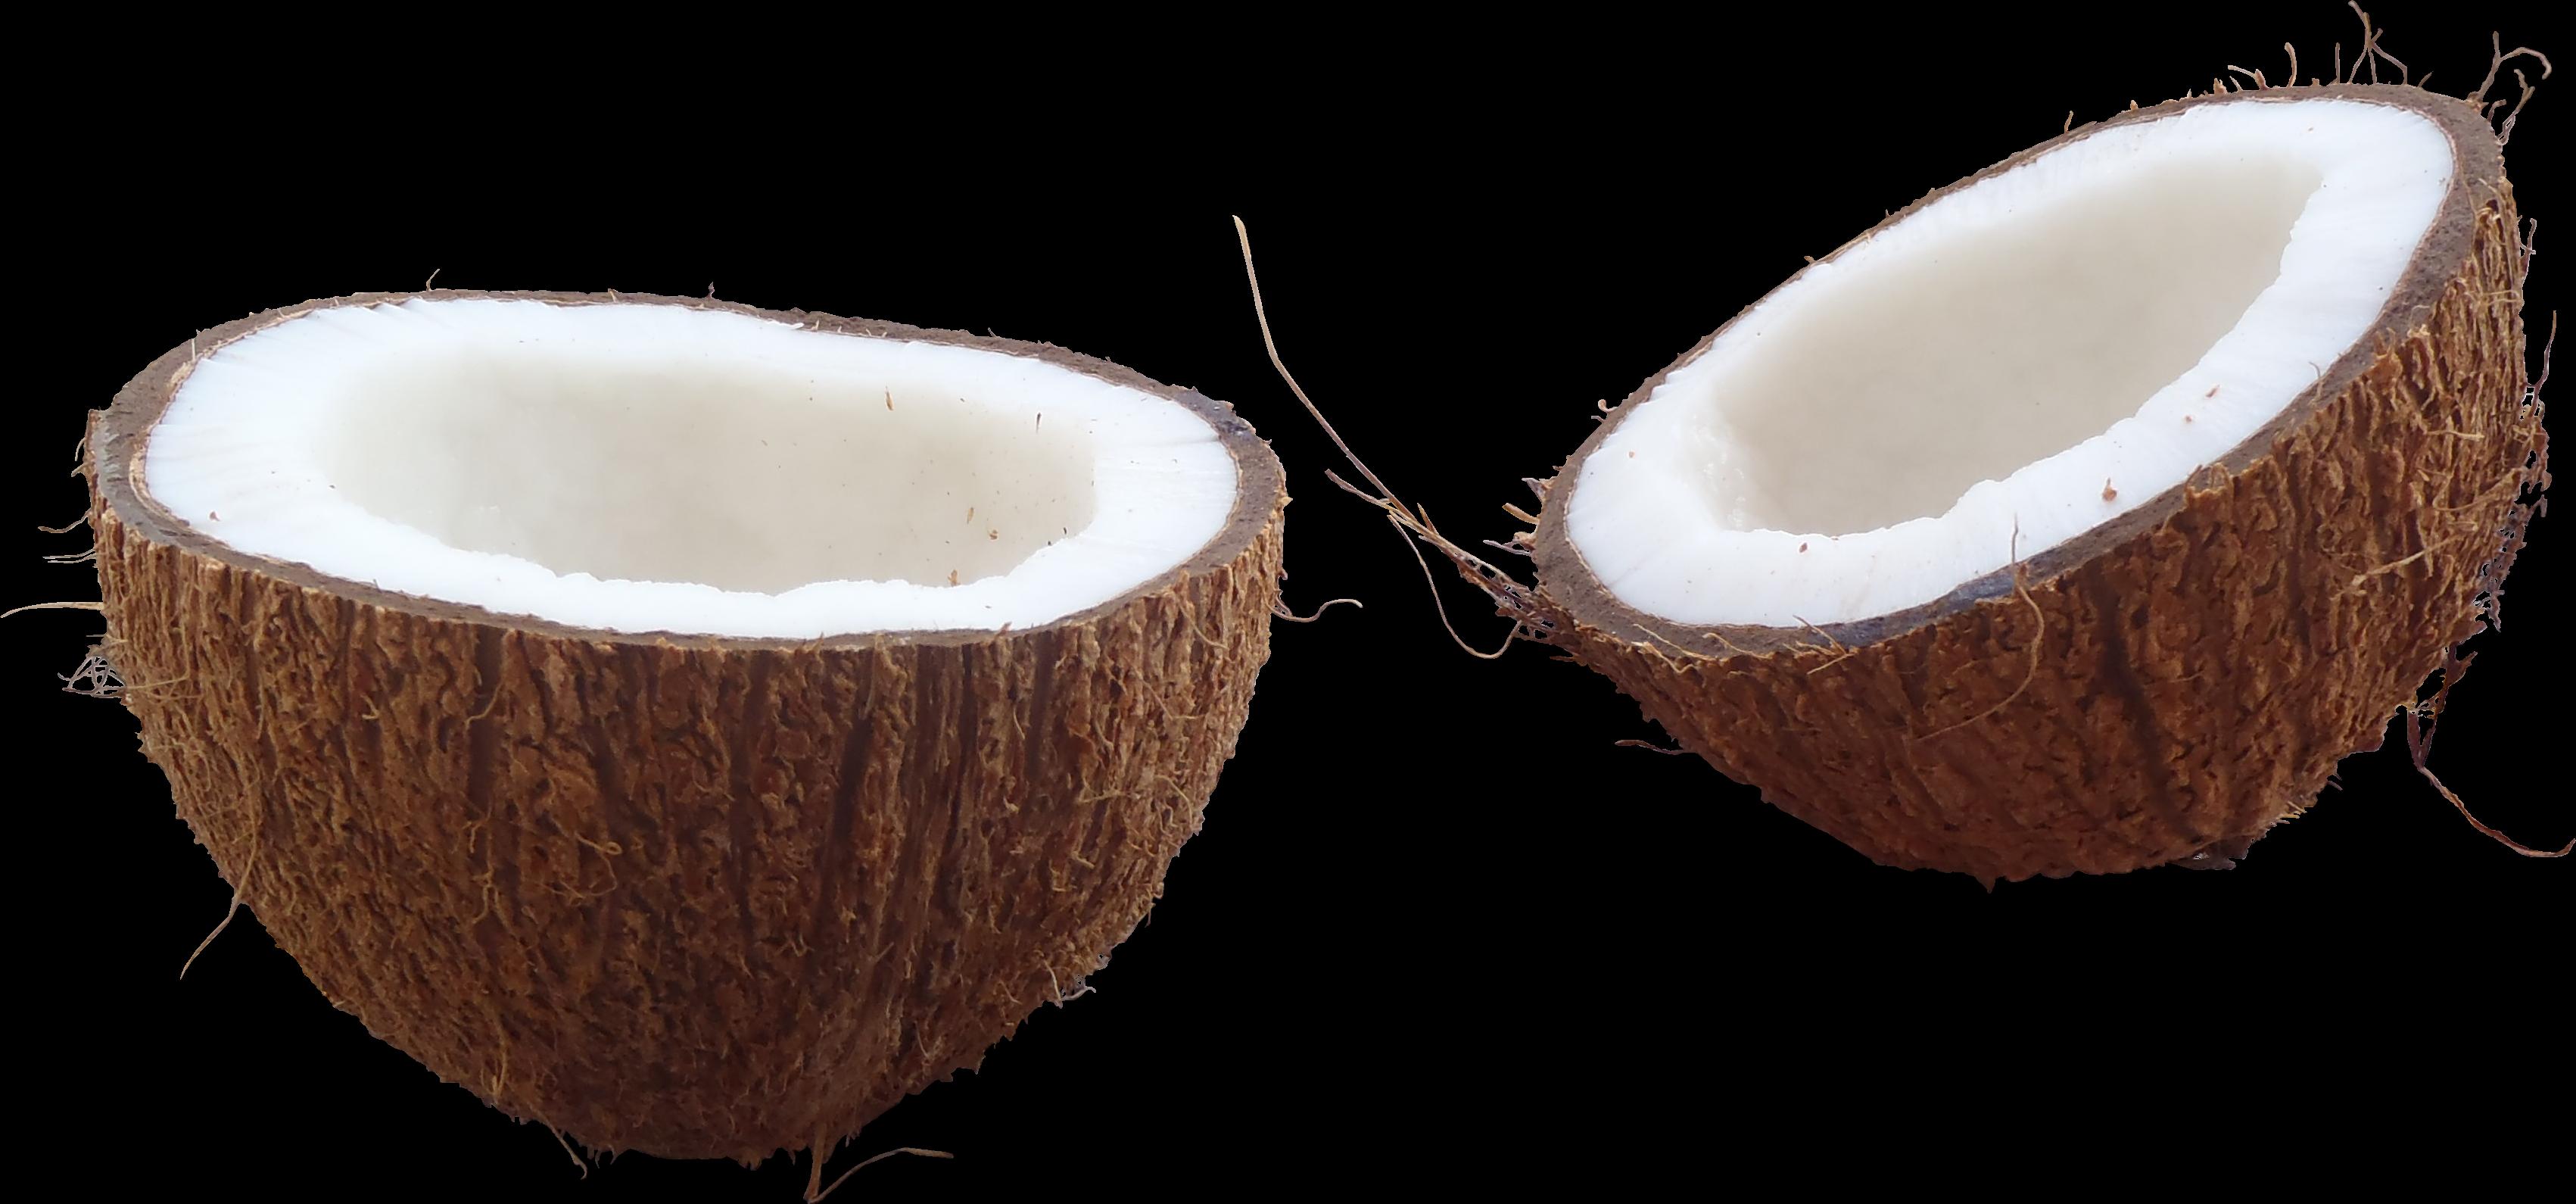 Coconut PNG Images Transparent Free Download.